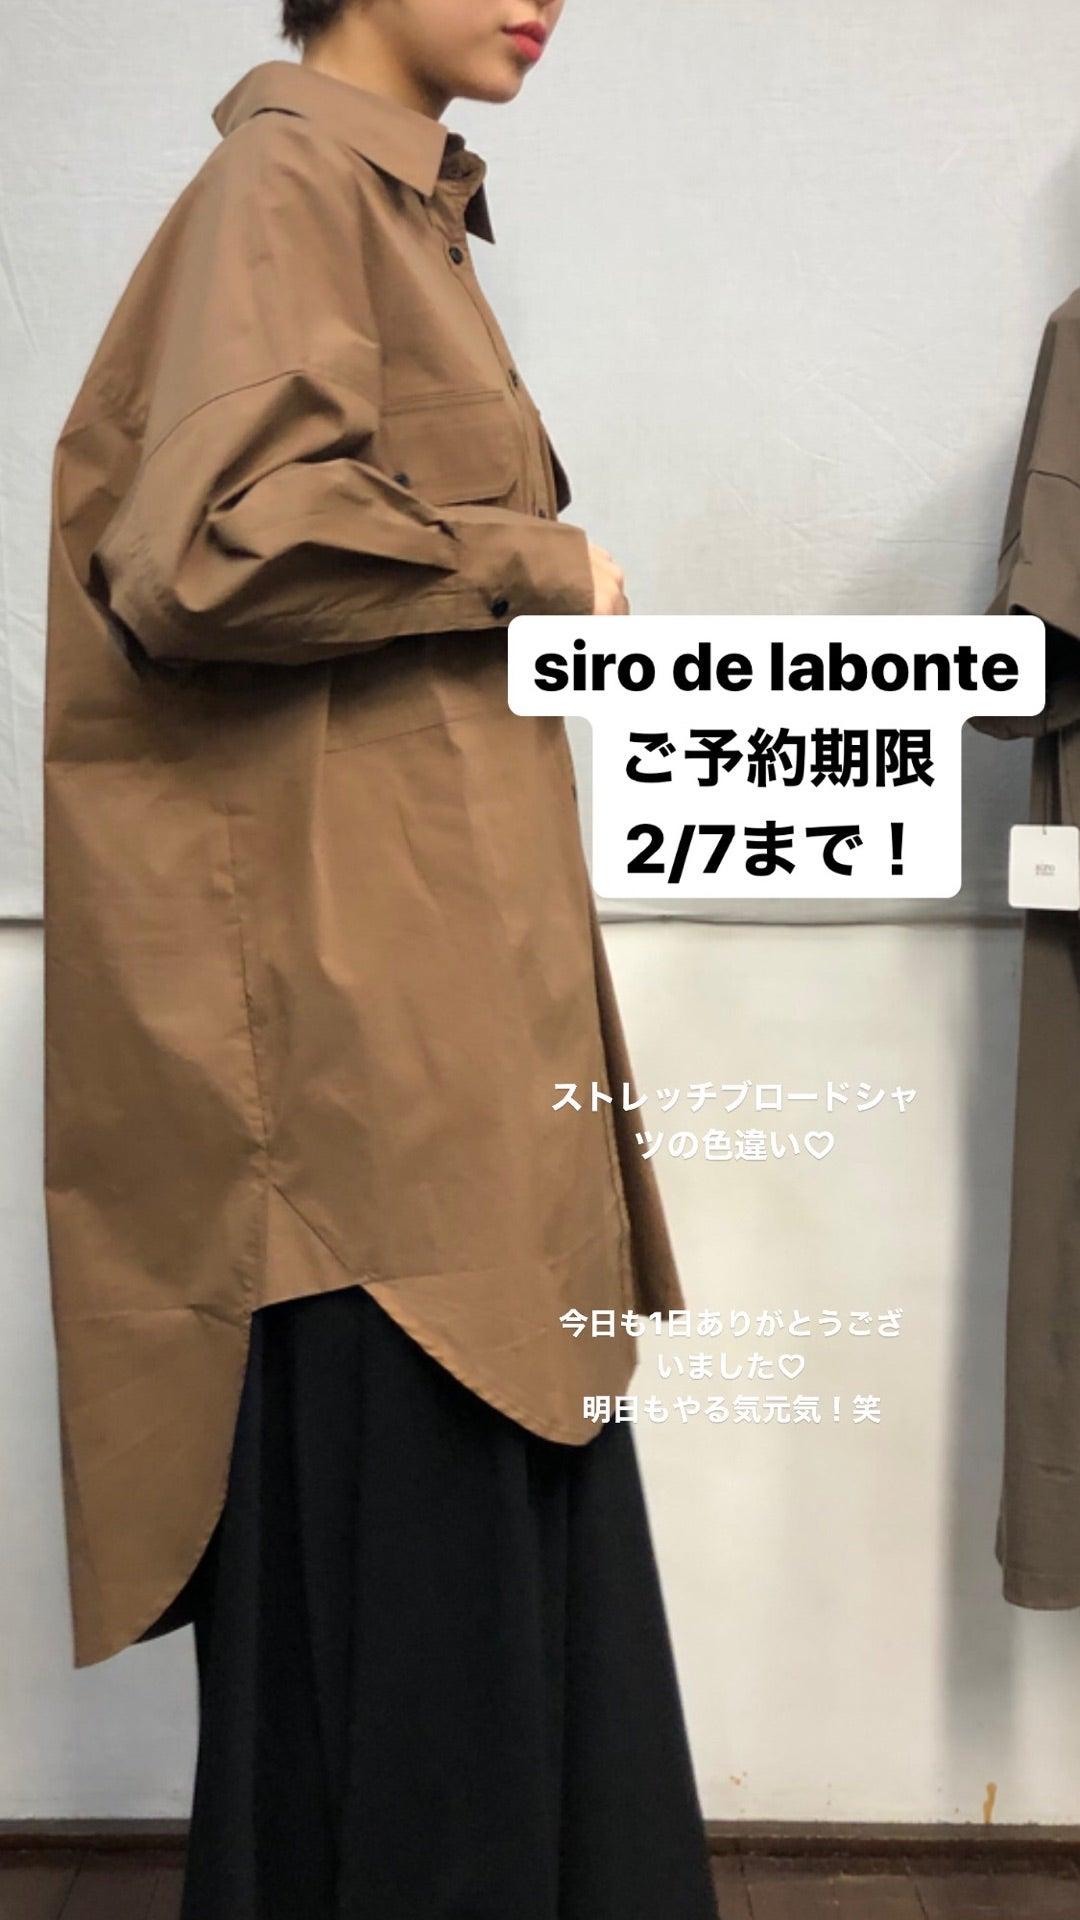 「siro de labonte」展示会速報